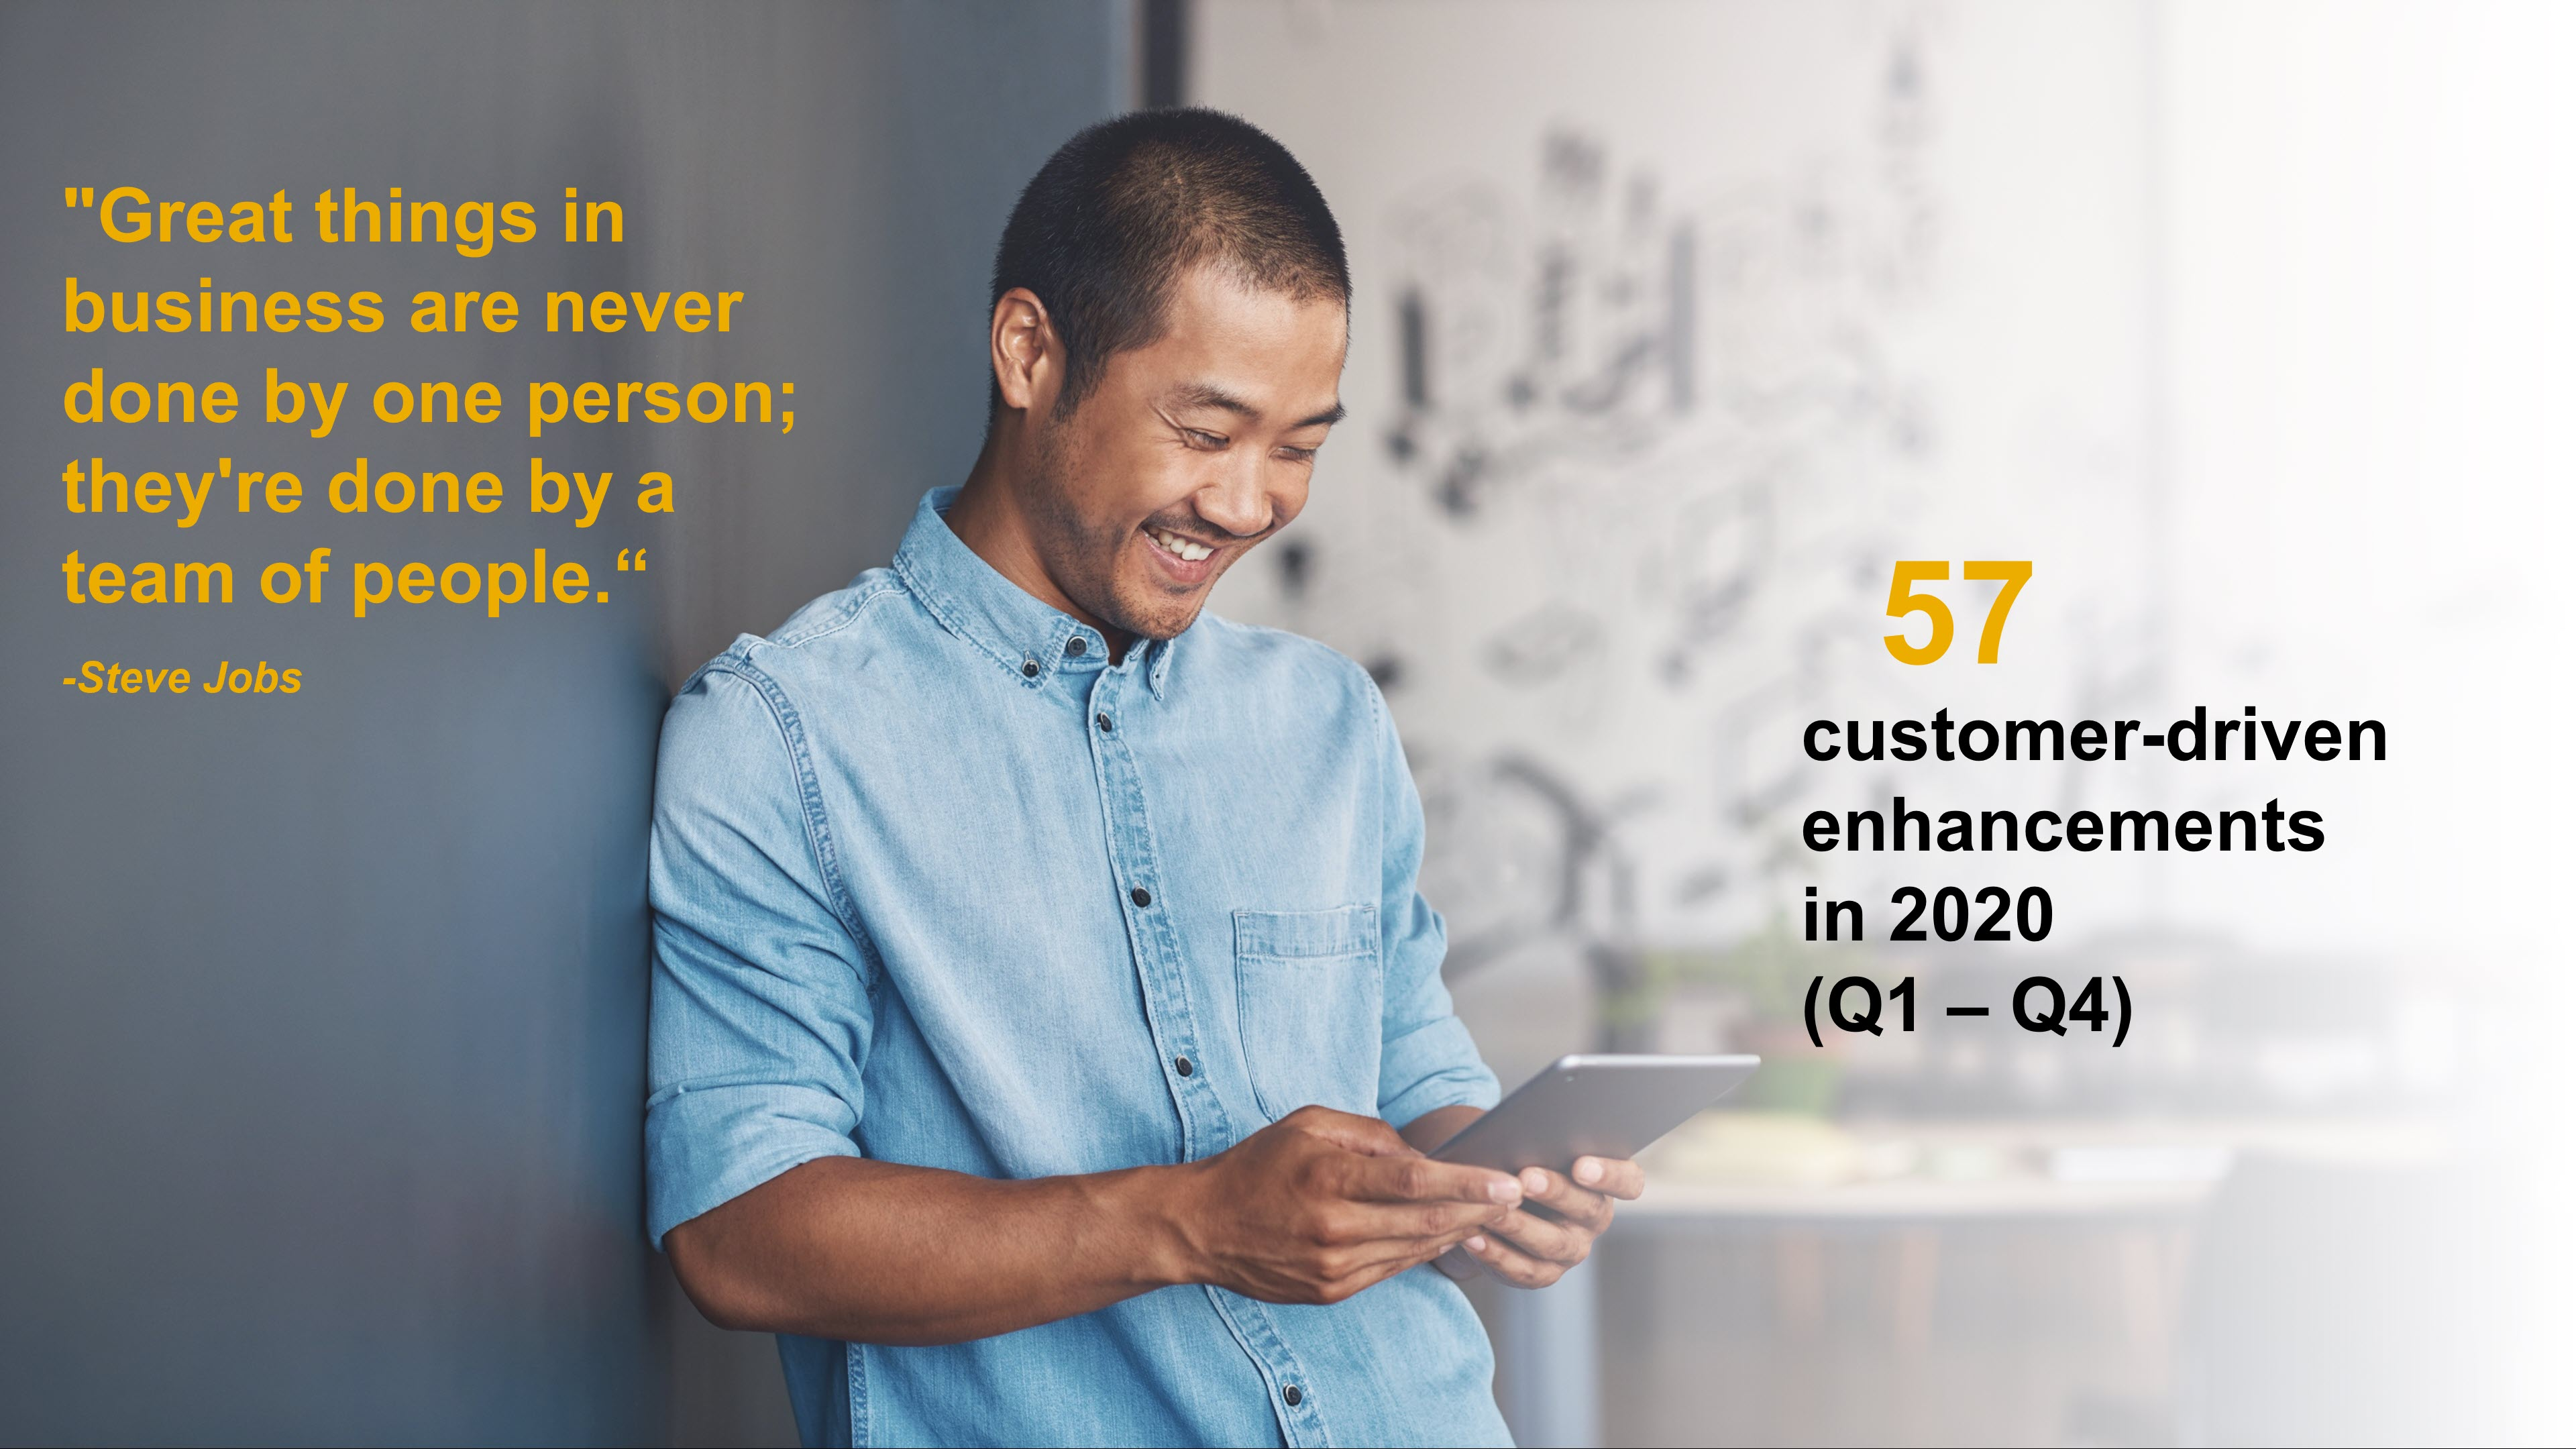 Customer-driven%20enhancements%20in%202020